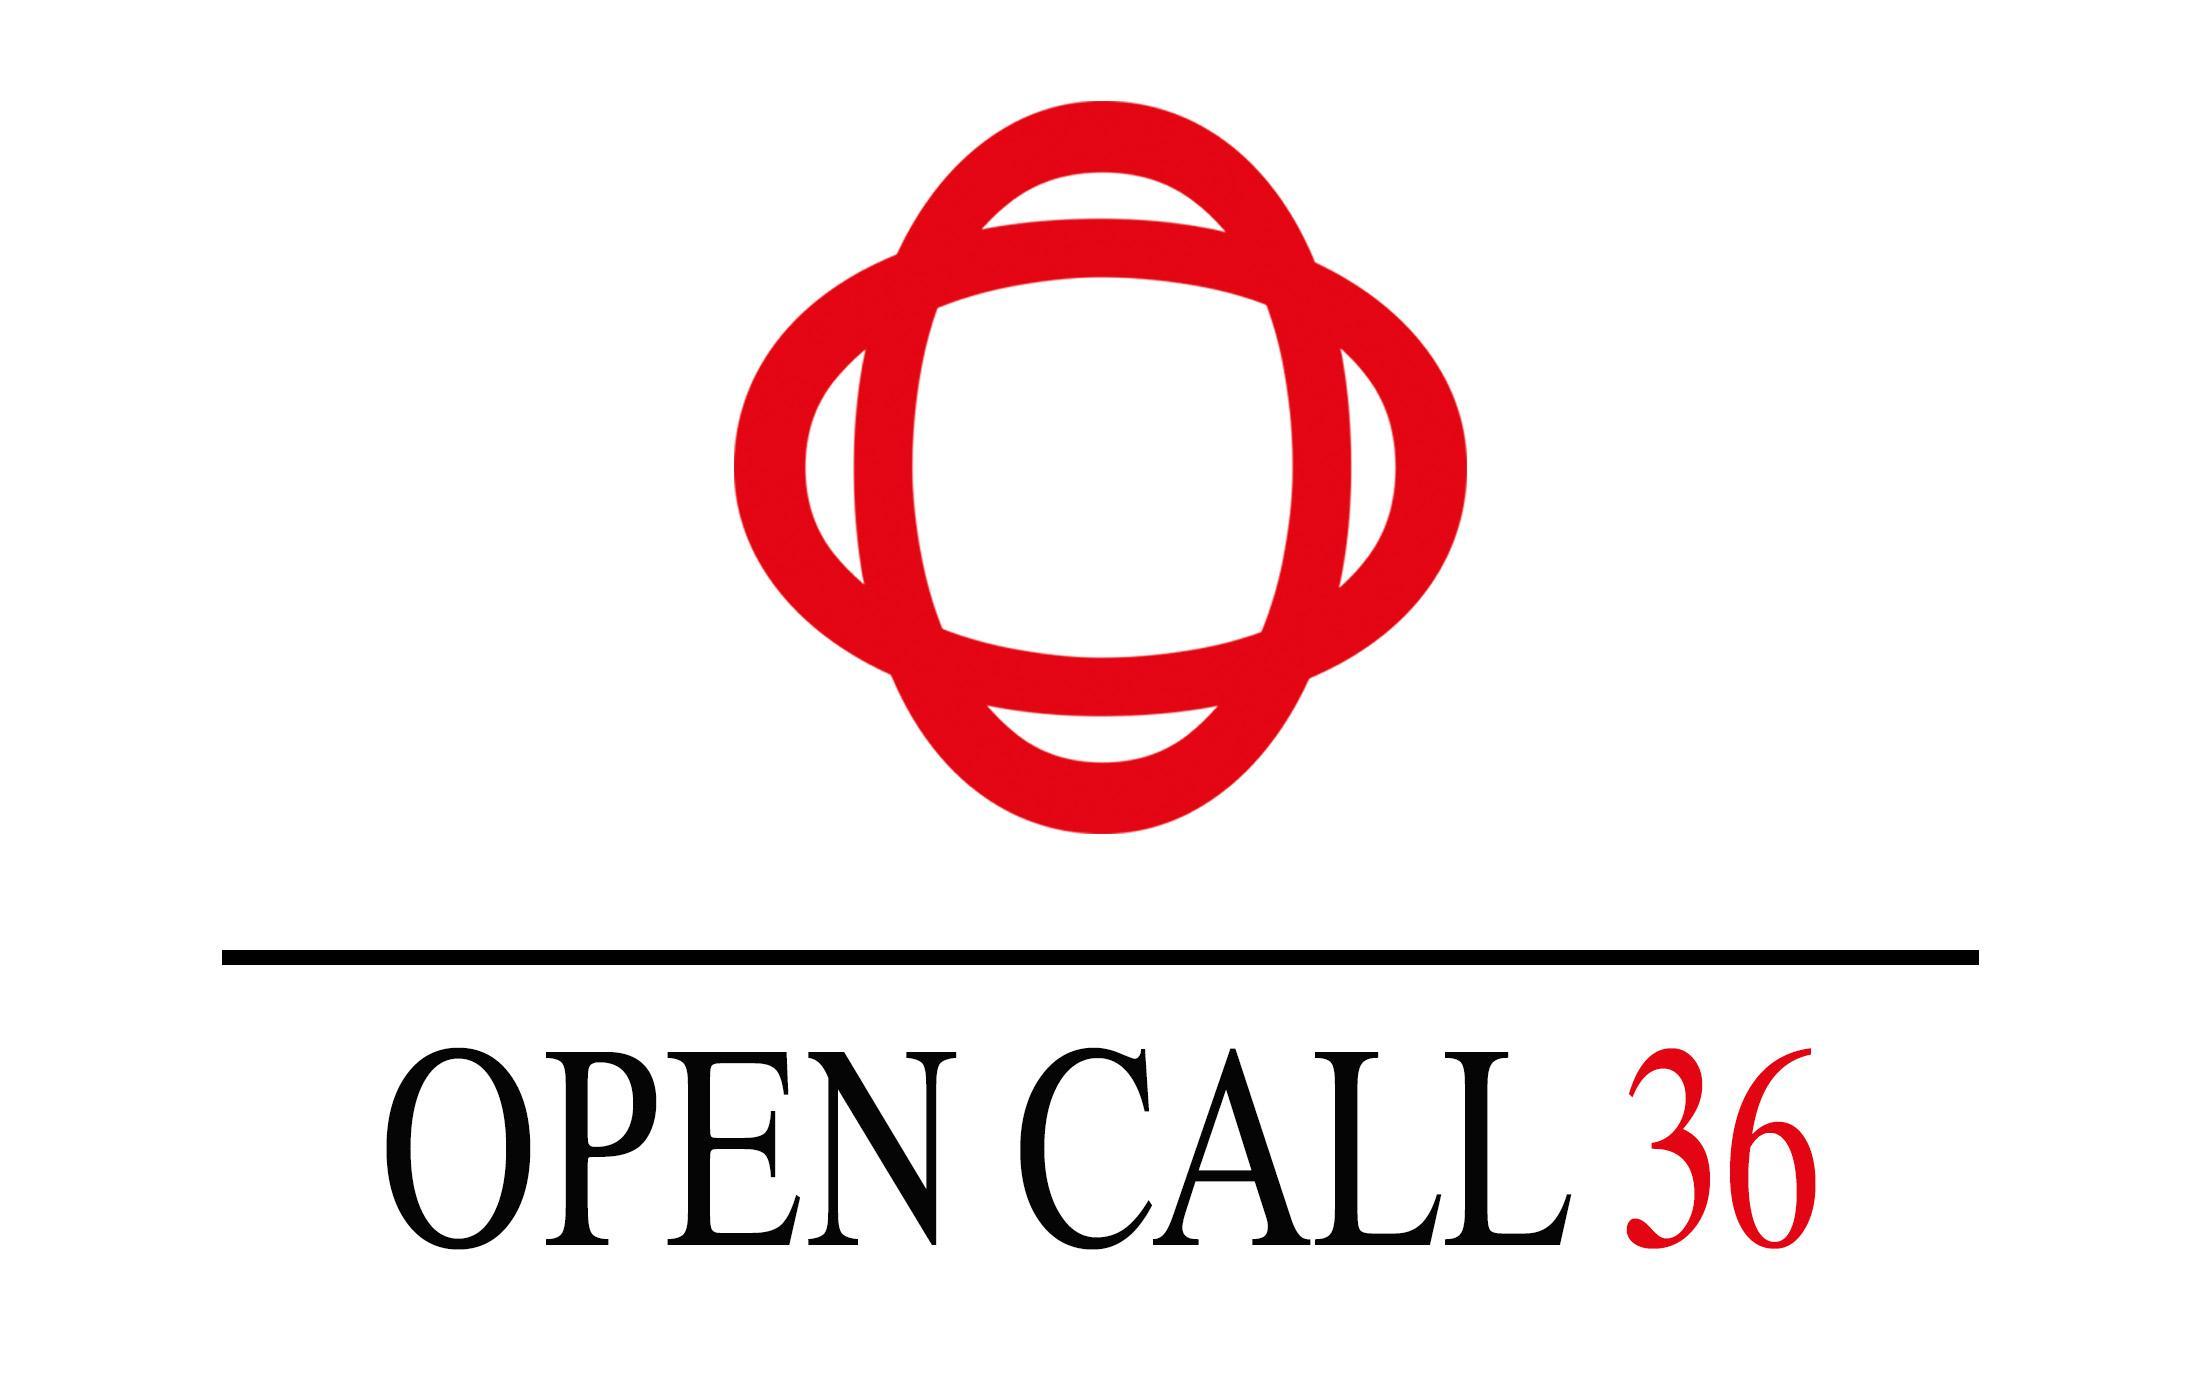 Open Call 36